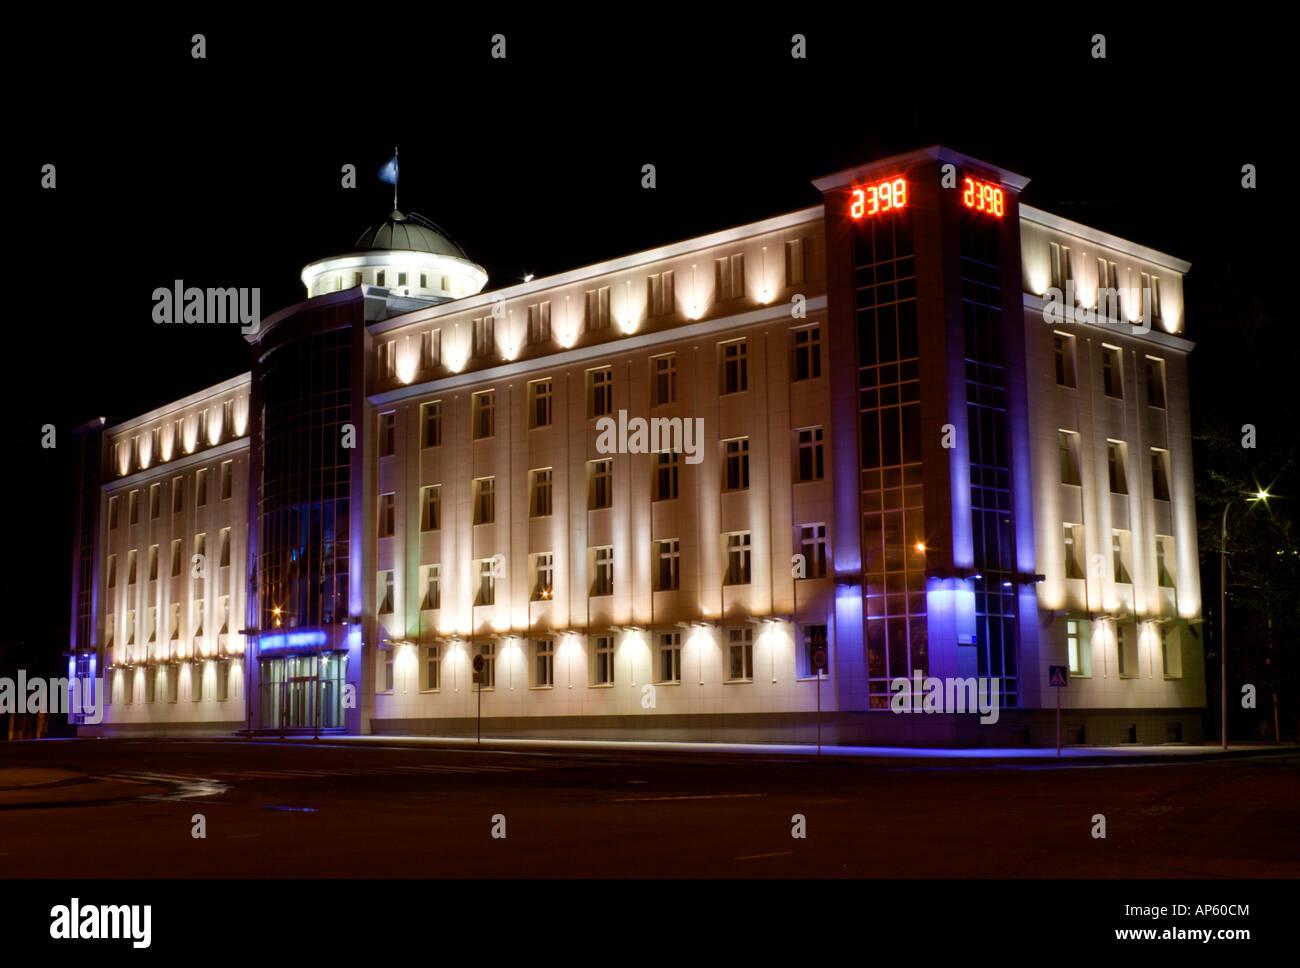 nightview of edifice IrkutskEnergo with floodlight - Stock Image